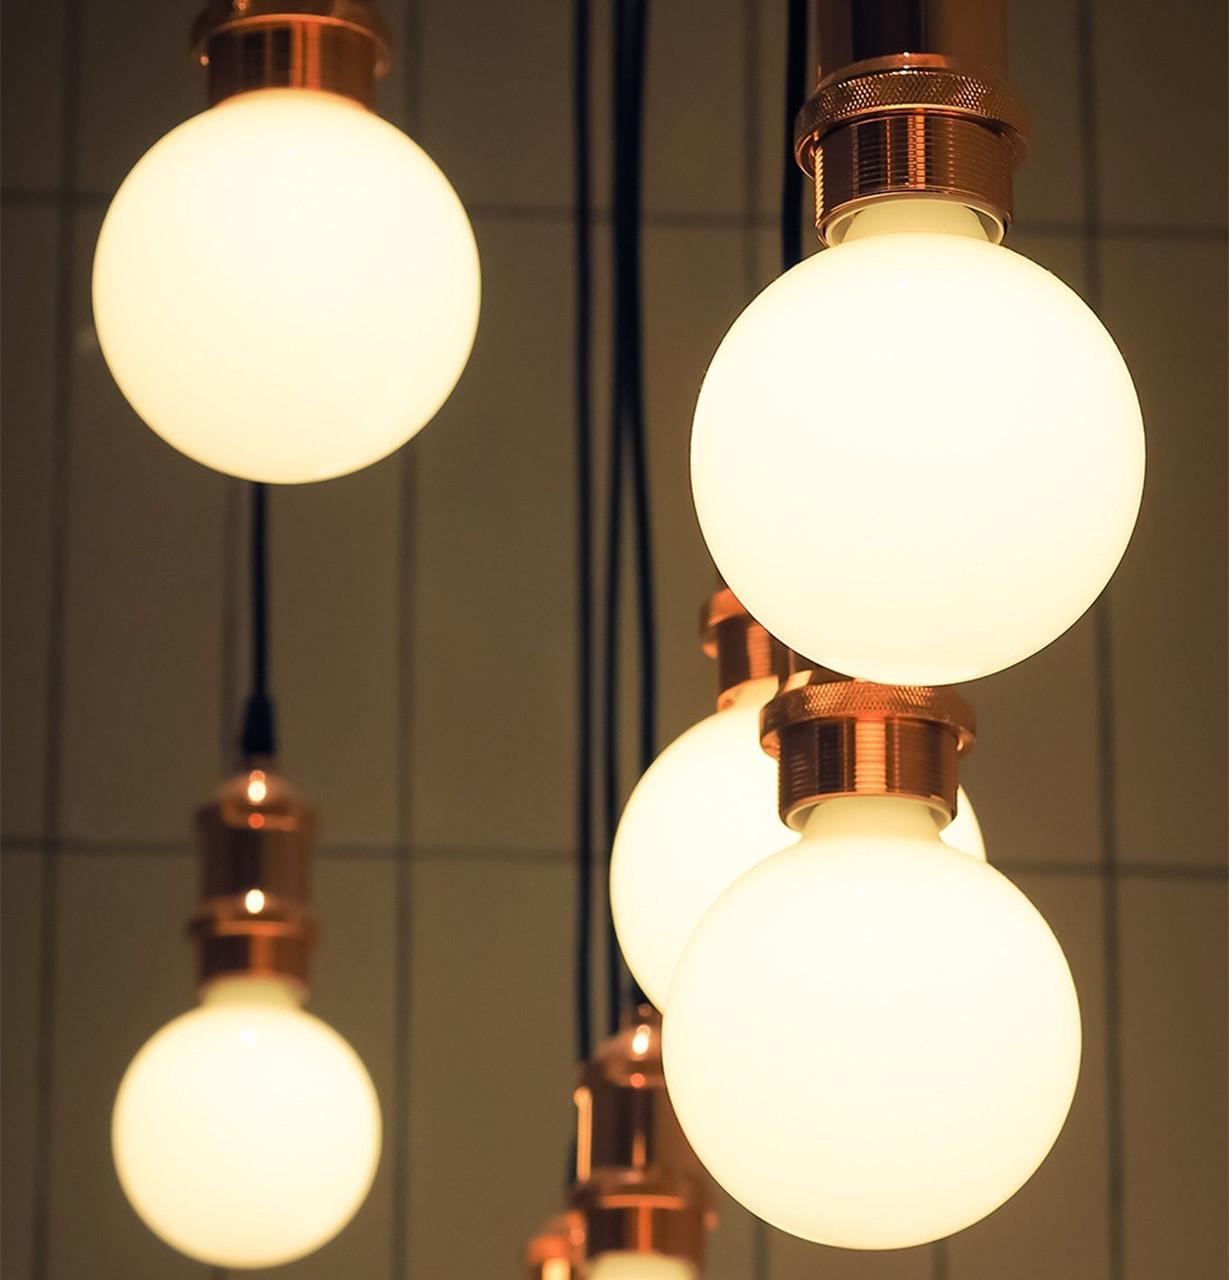 Crompton Lamps LED Globe 5W Light Bulbs